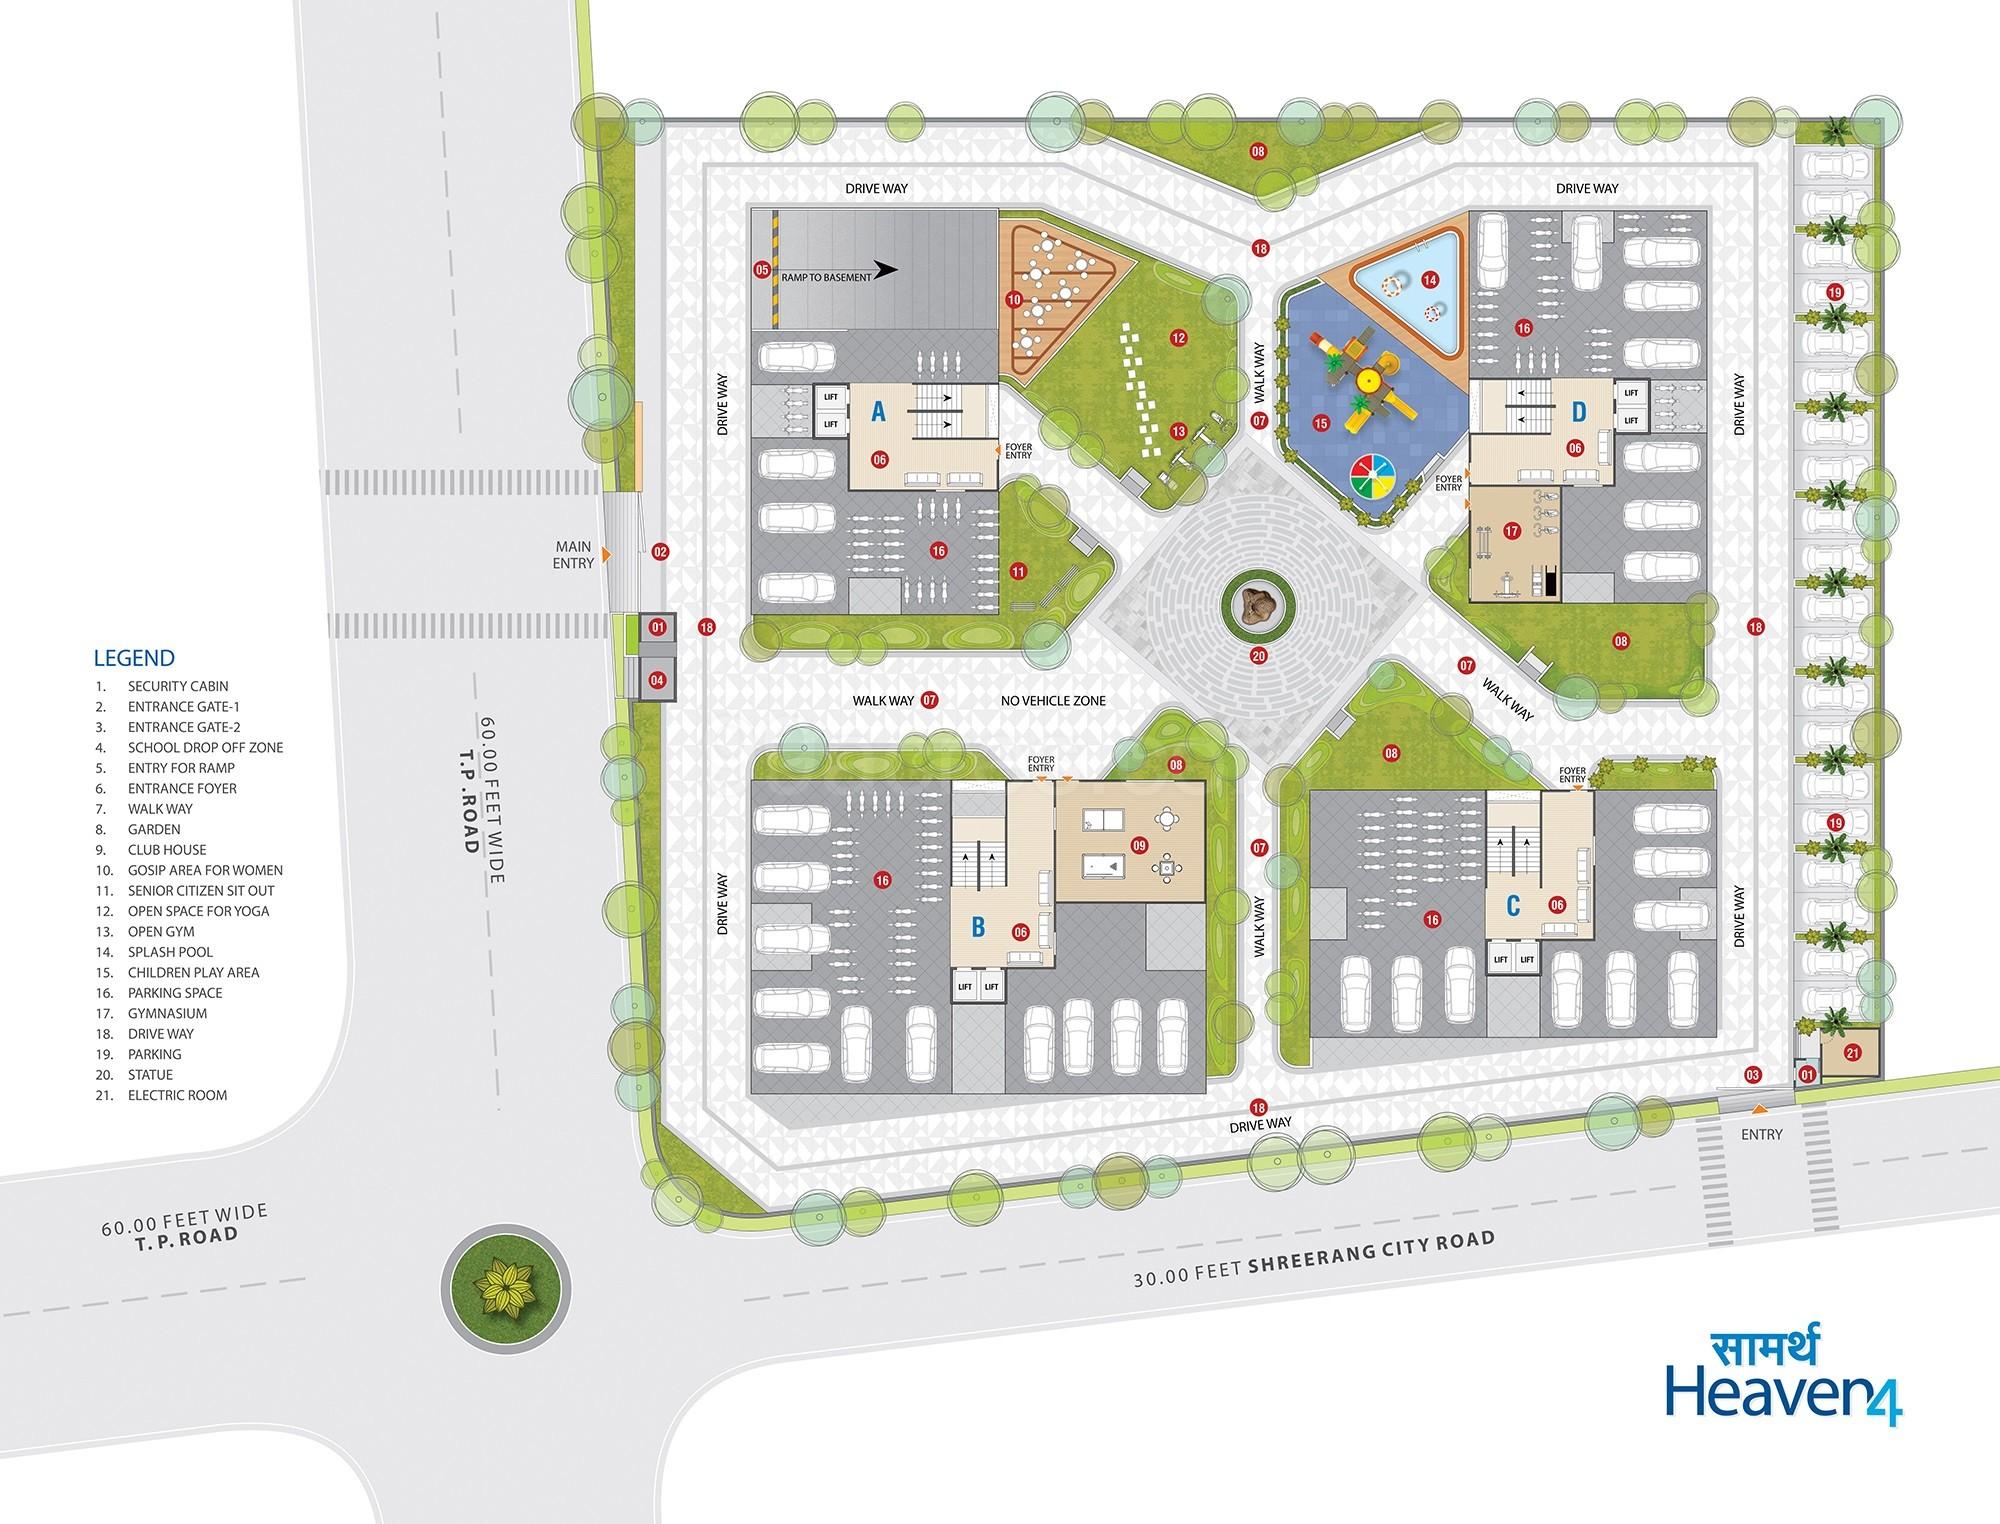 SRS Corporation Saamarth Heaven 4 Floor Plan - Saamarth Heaven 4